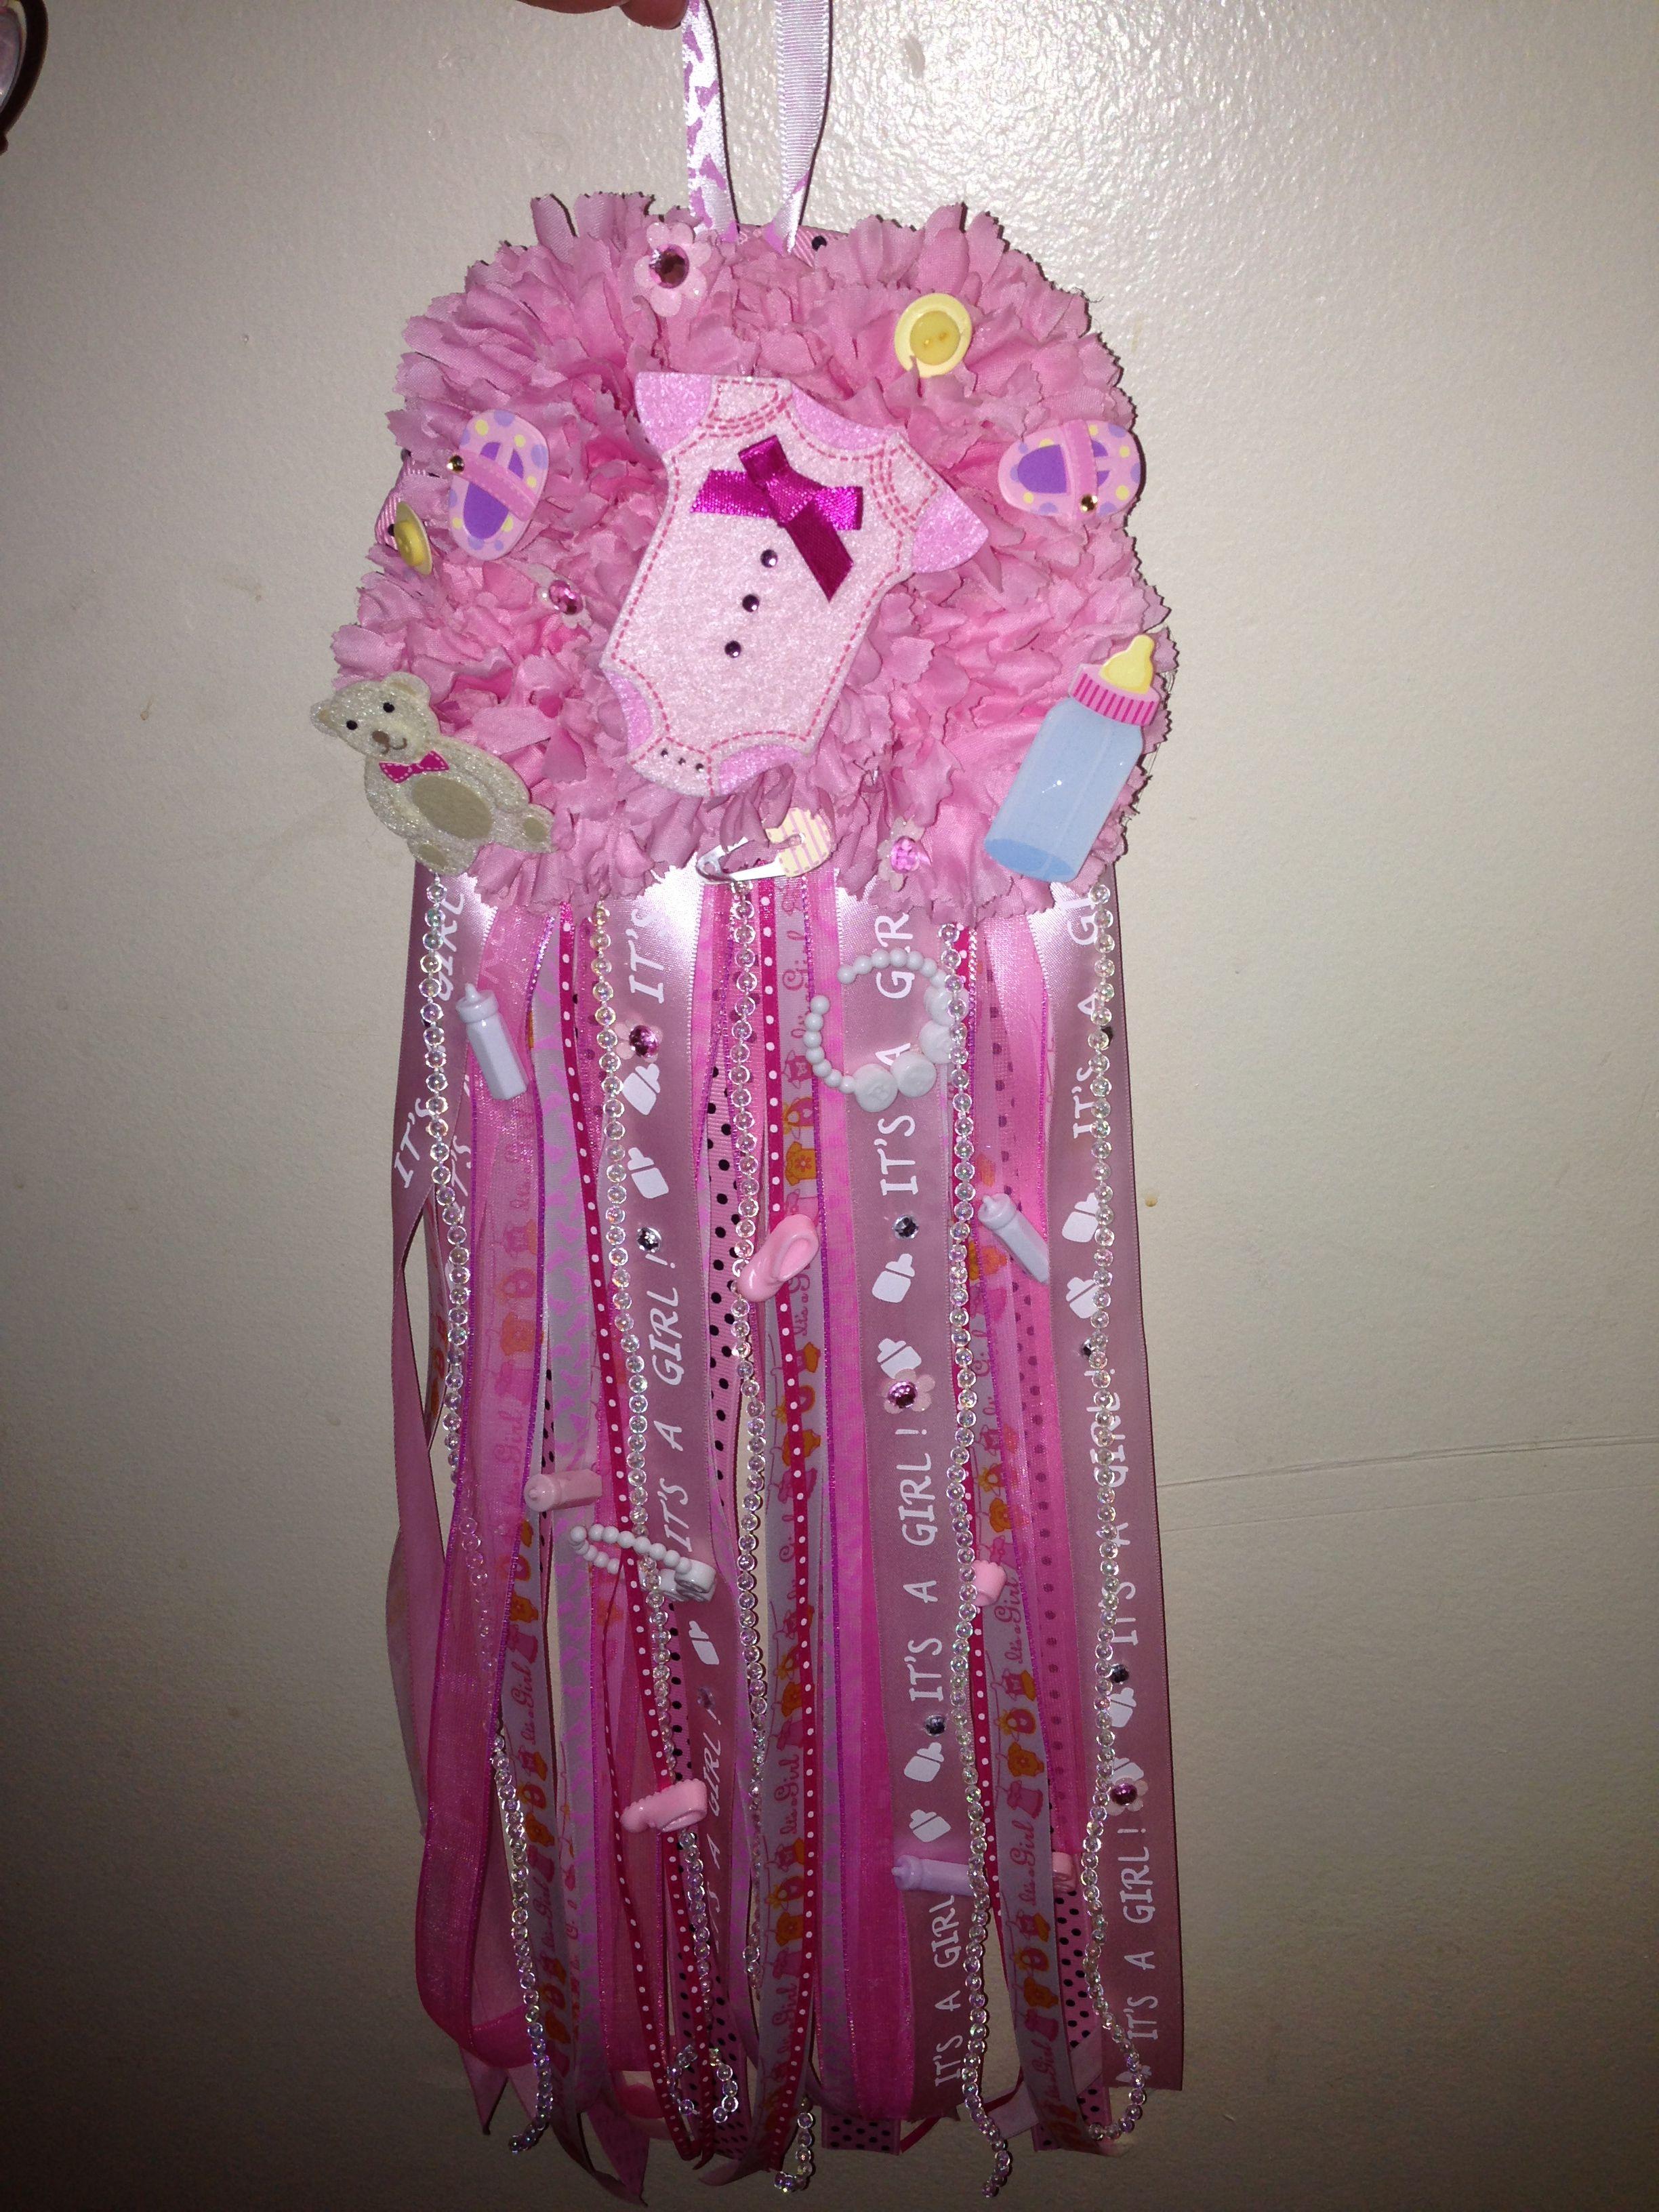 Baby Shower Mums ~ Pink baby shower mum ideas pinterest